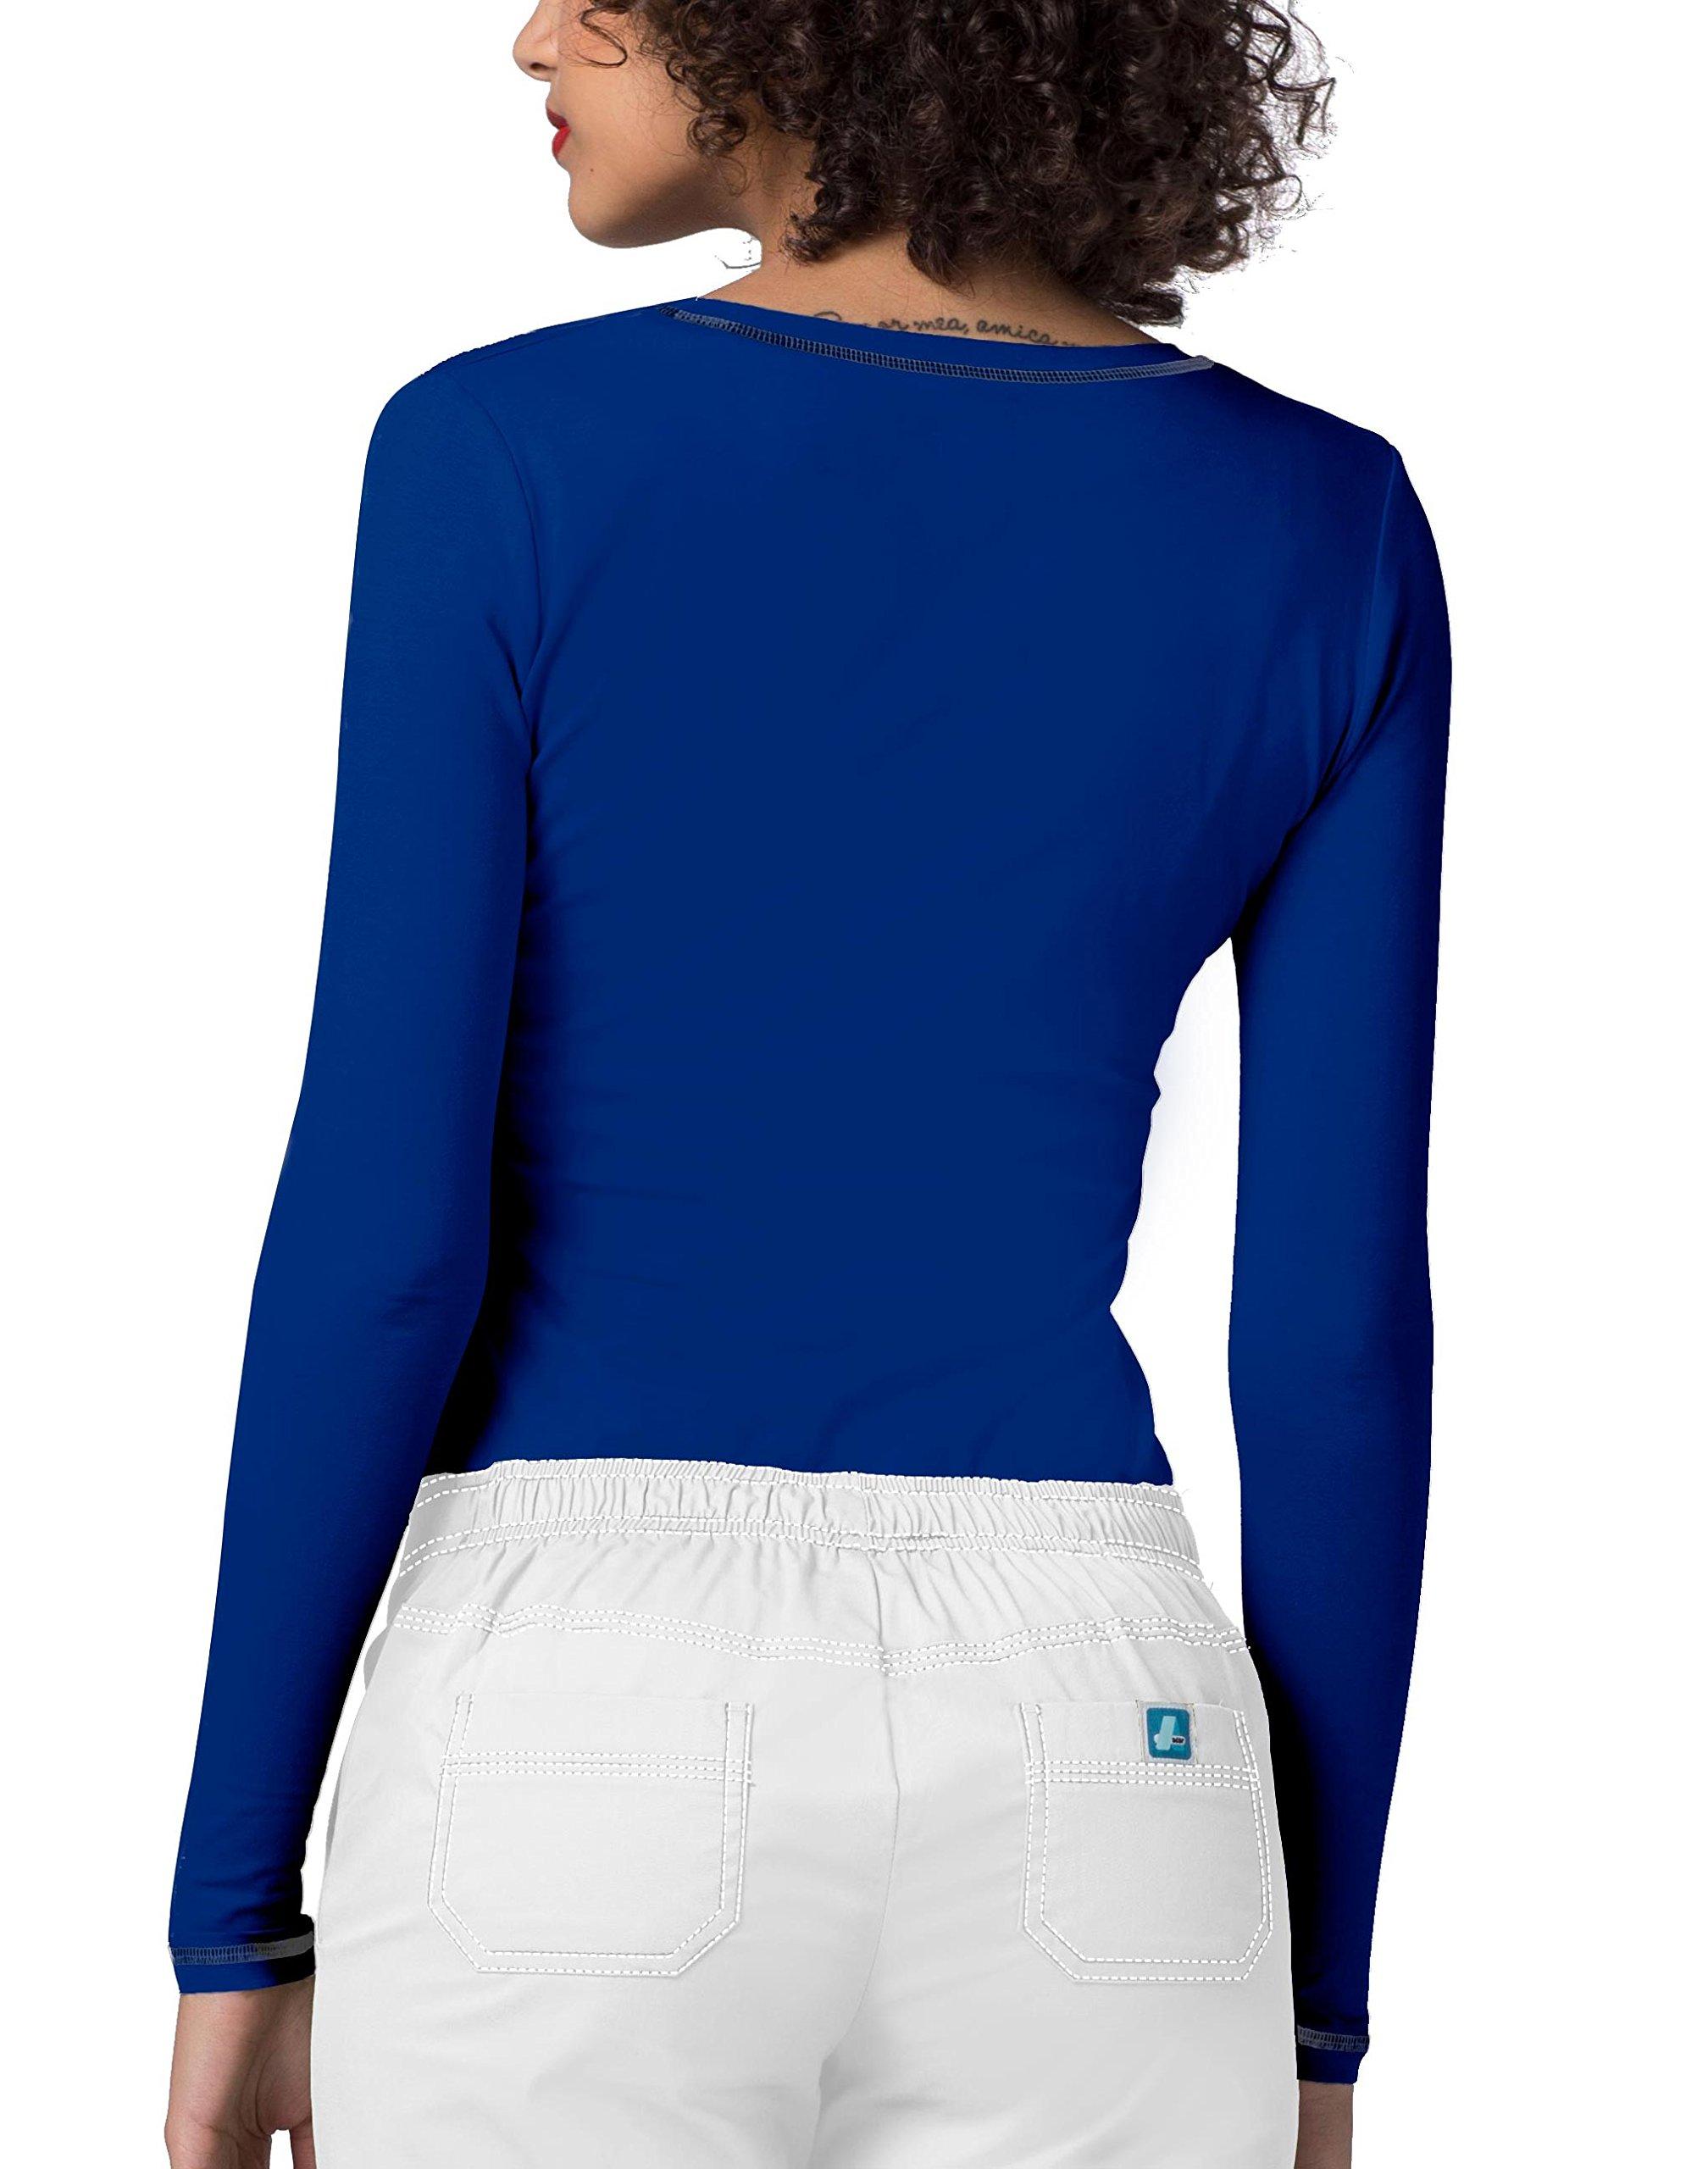 Adar Womens Comfort Long Sleeve Fitted T-Shirt Underscrub Tee- 3400 - Royal Blue - L by ADAR UNIFORMS (Image #2)